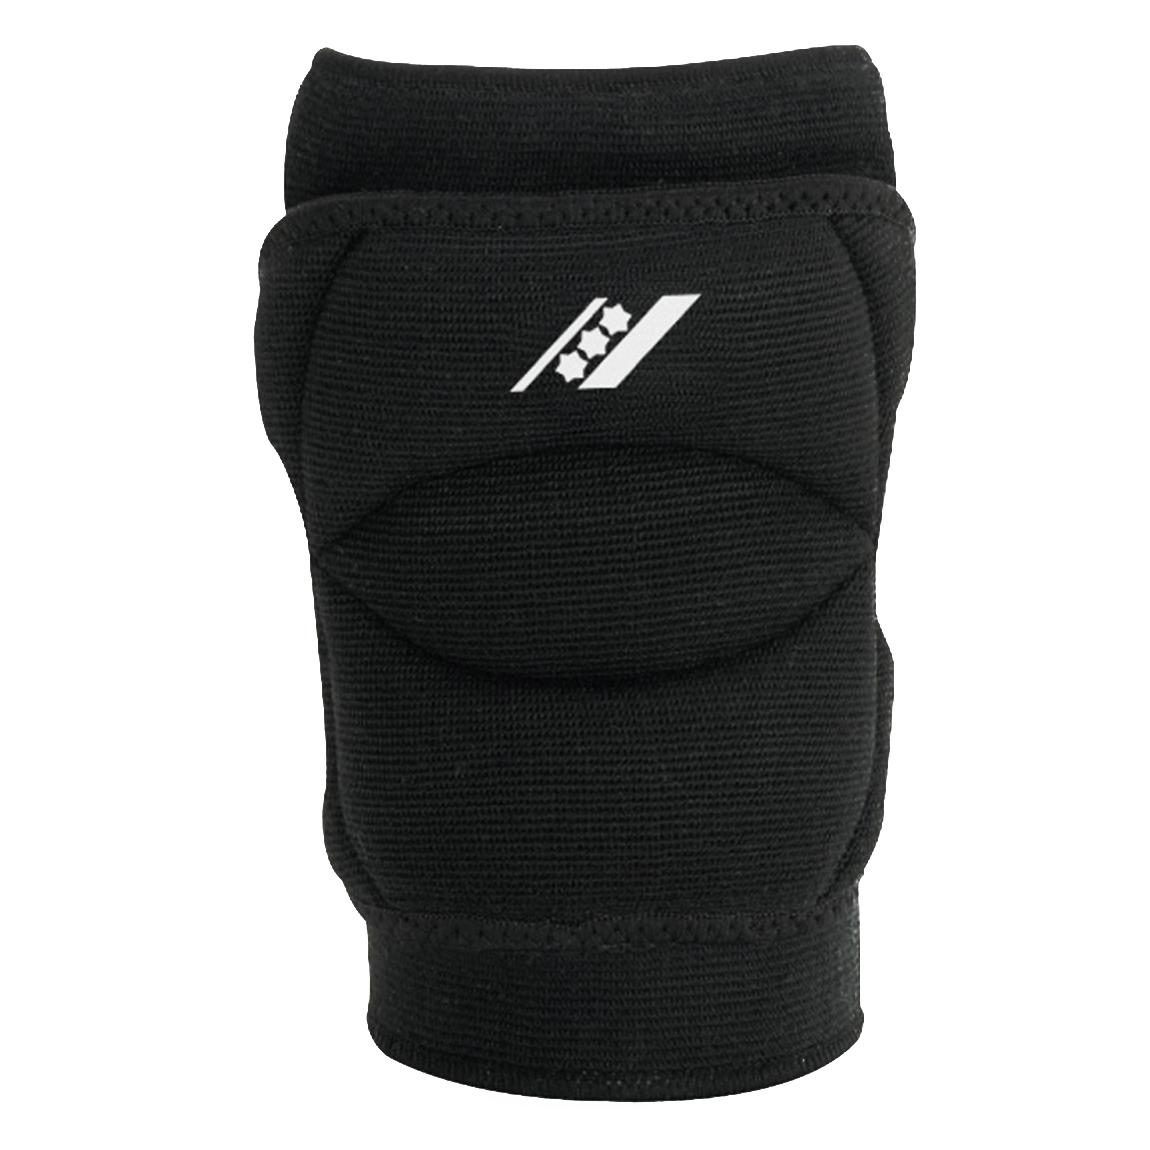 Image of   Rucanor Smash Knee Pads - Black - L